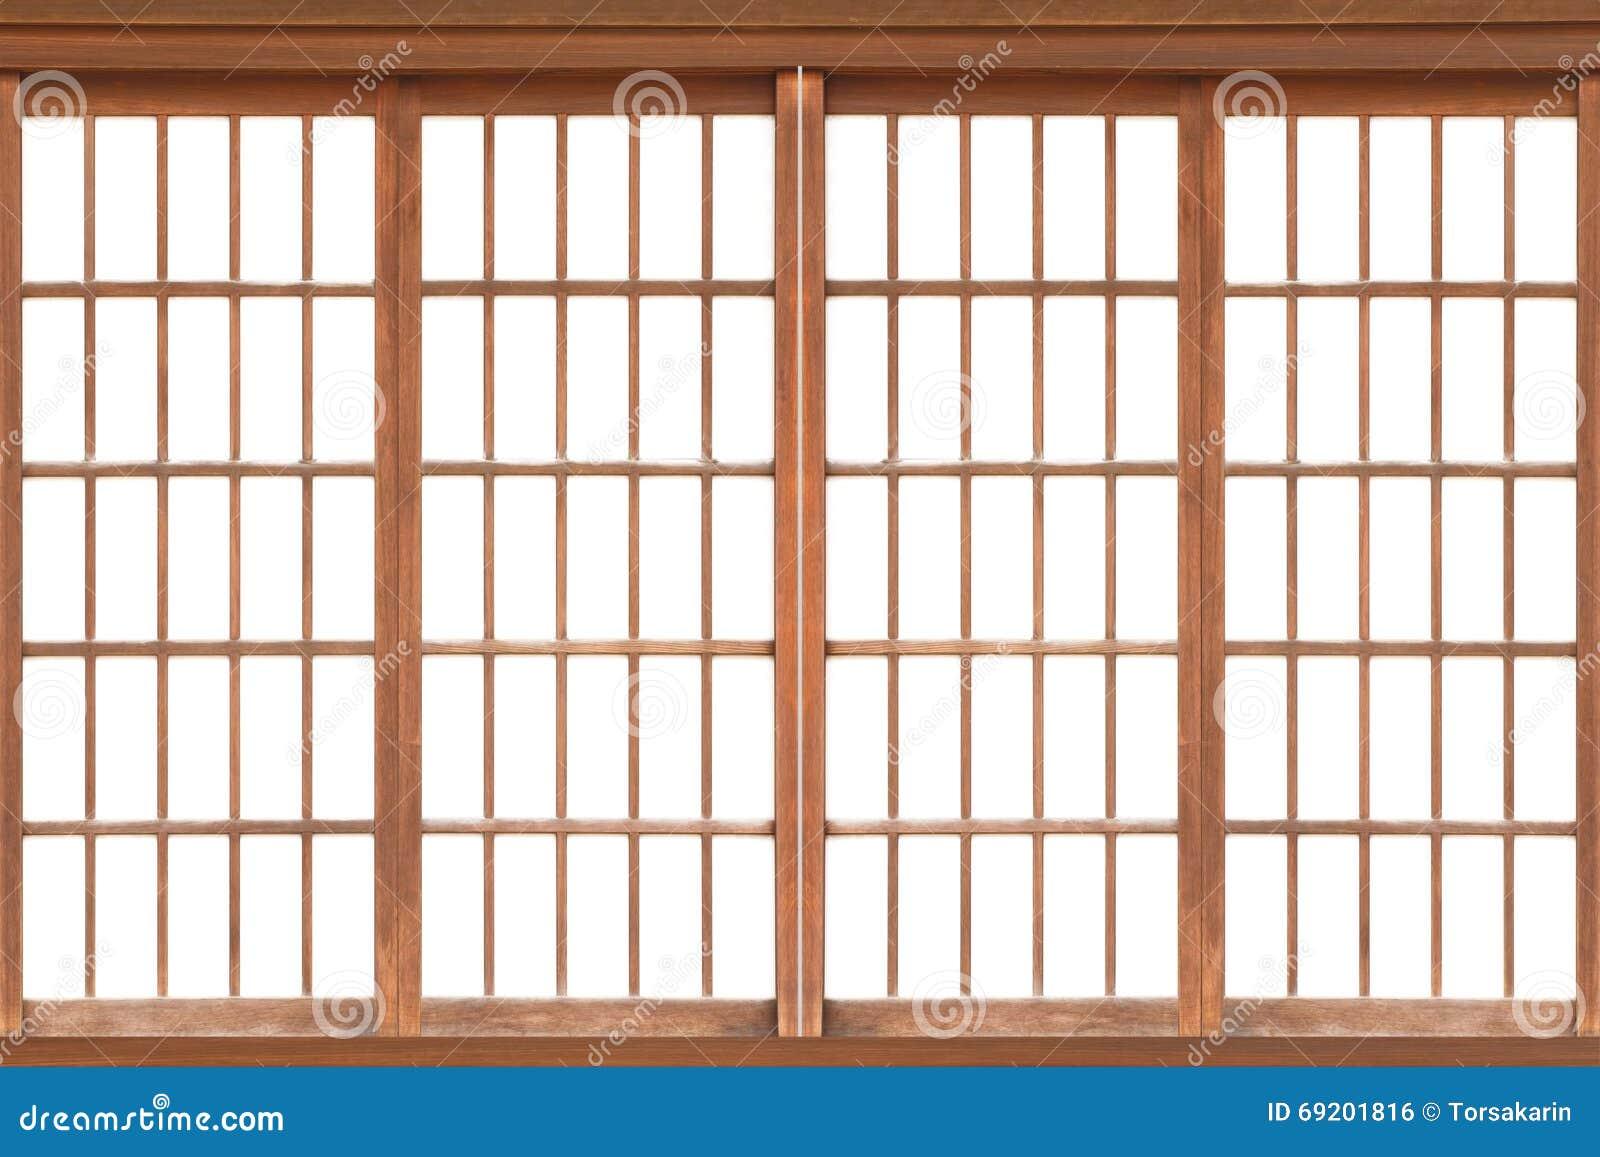 Shoji puerta japonesa tradicional ventana foto de - Puertas shoji ...